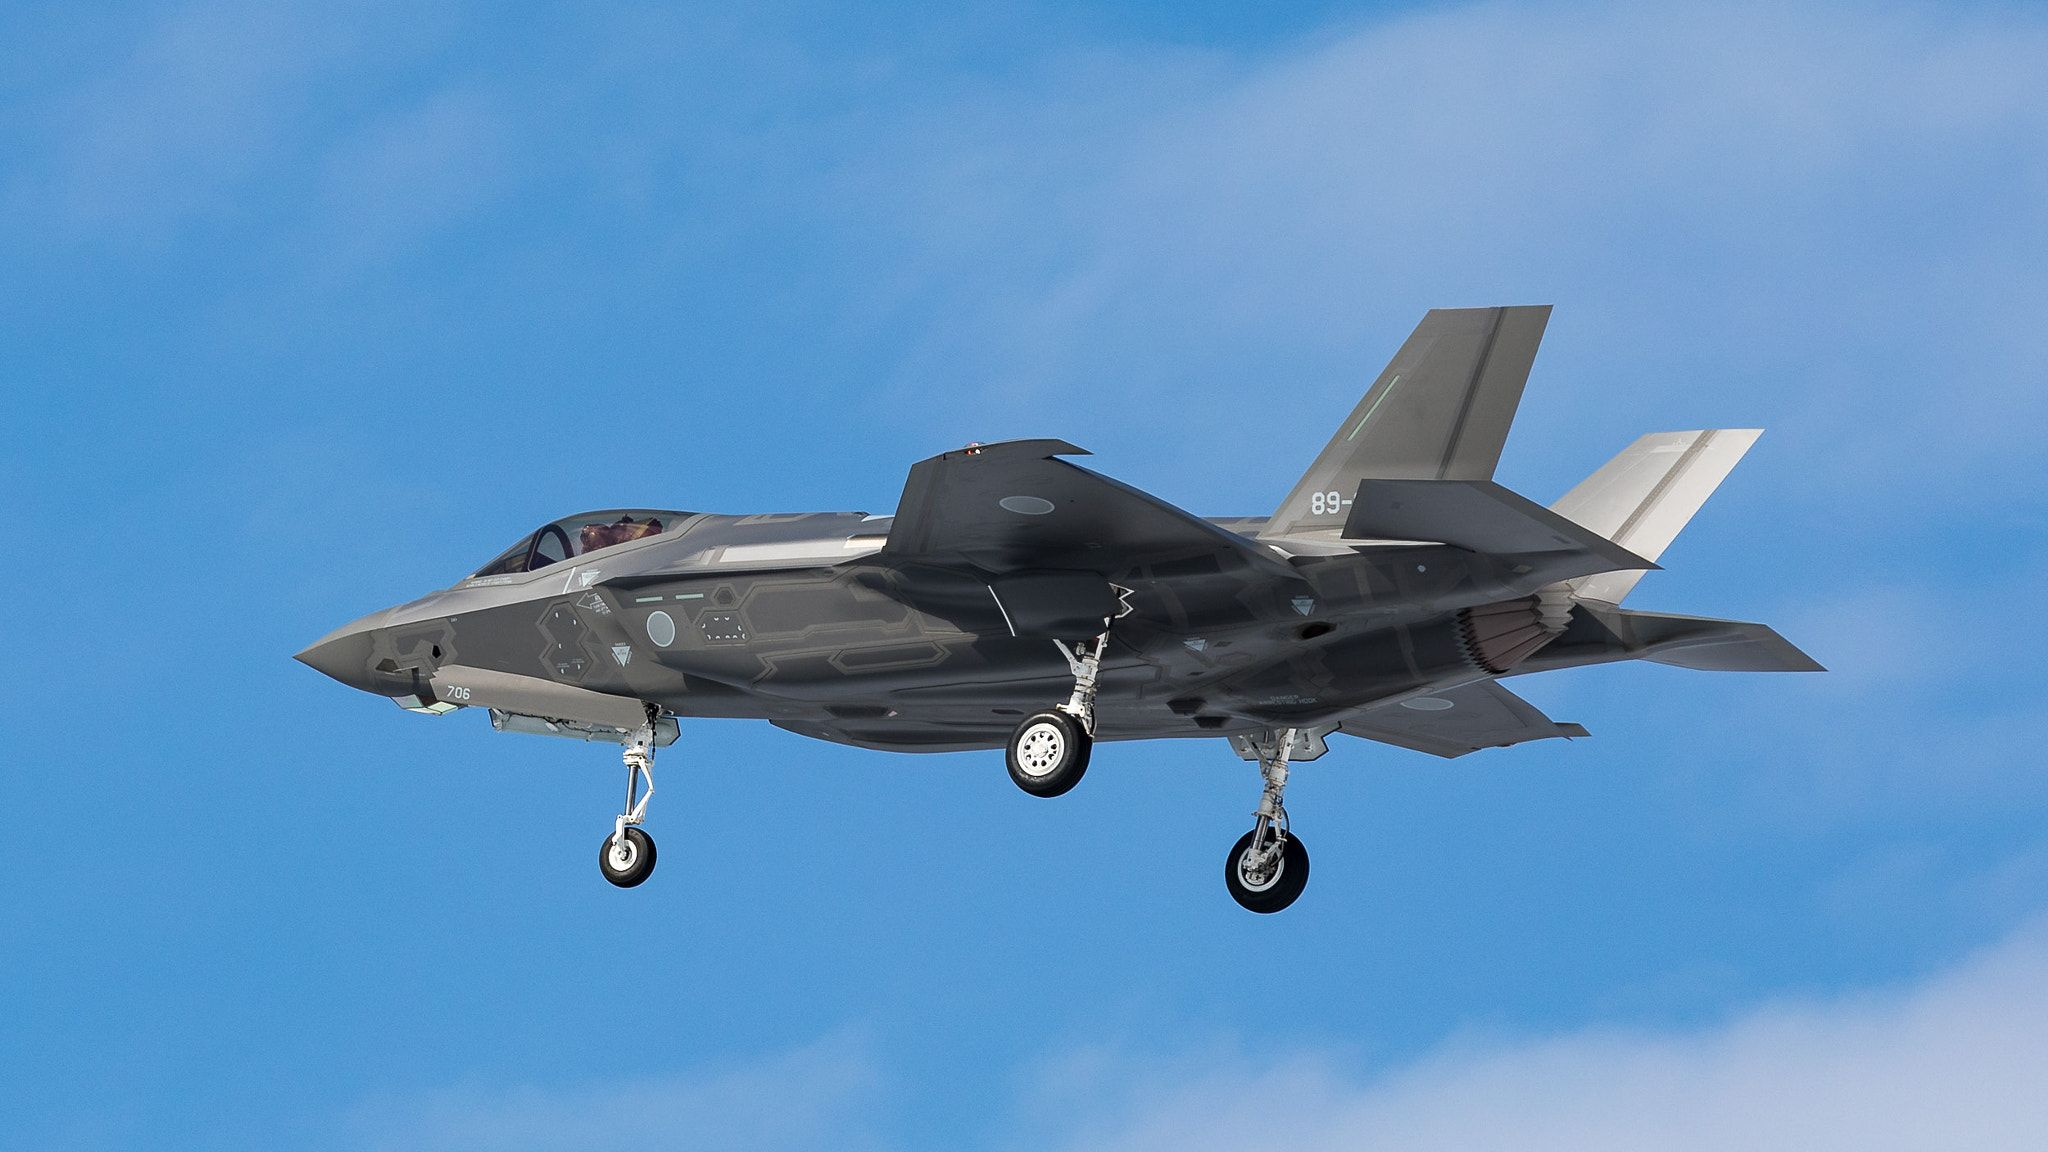 First JASDF F-35 - It\'s the future I guess | plains | Pinterest